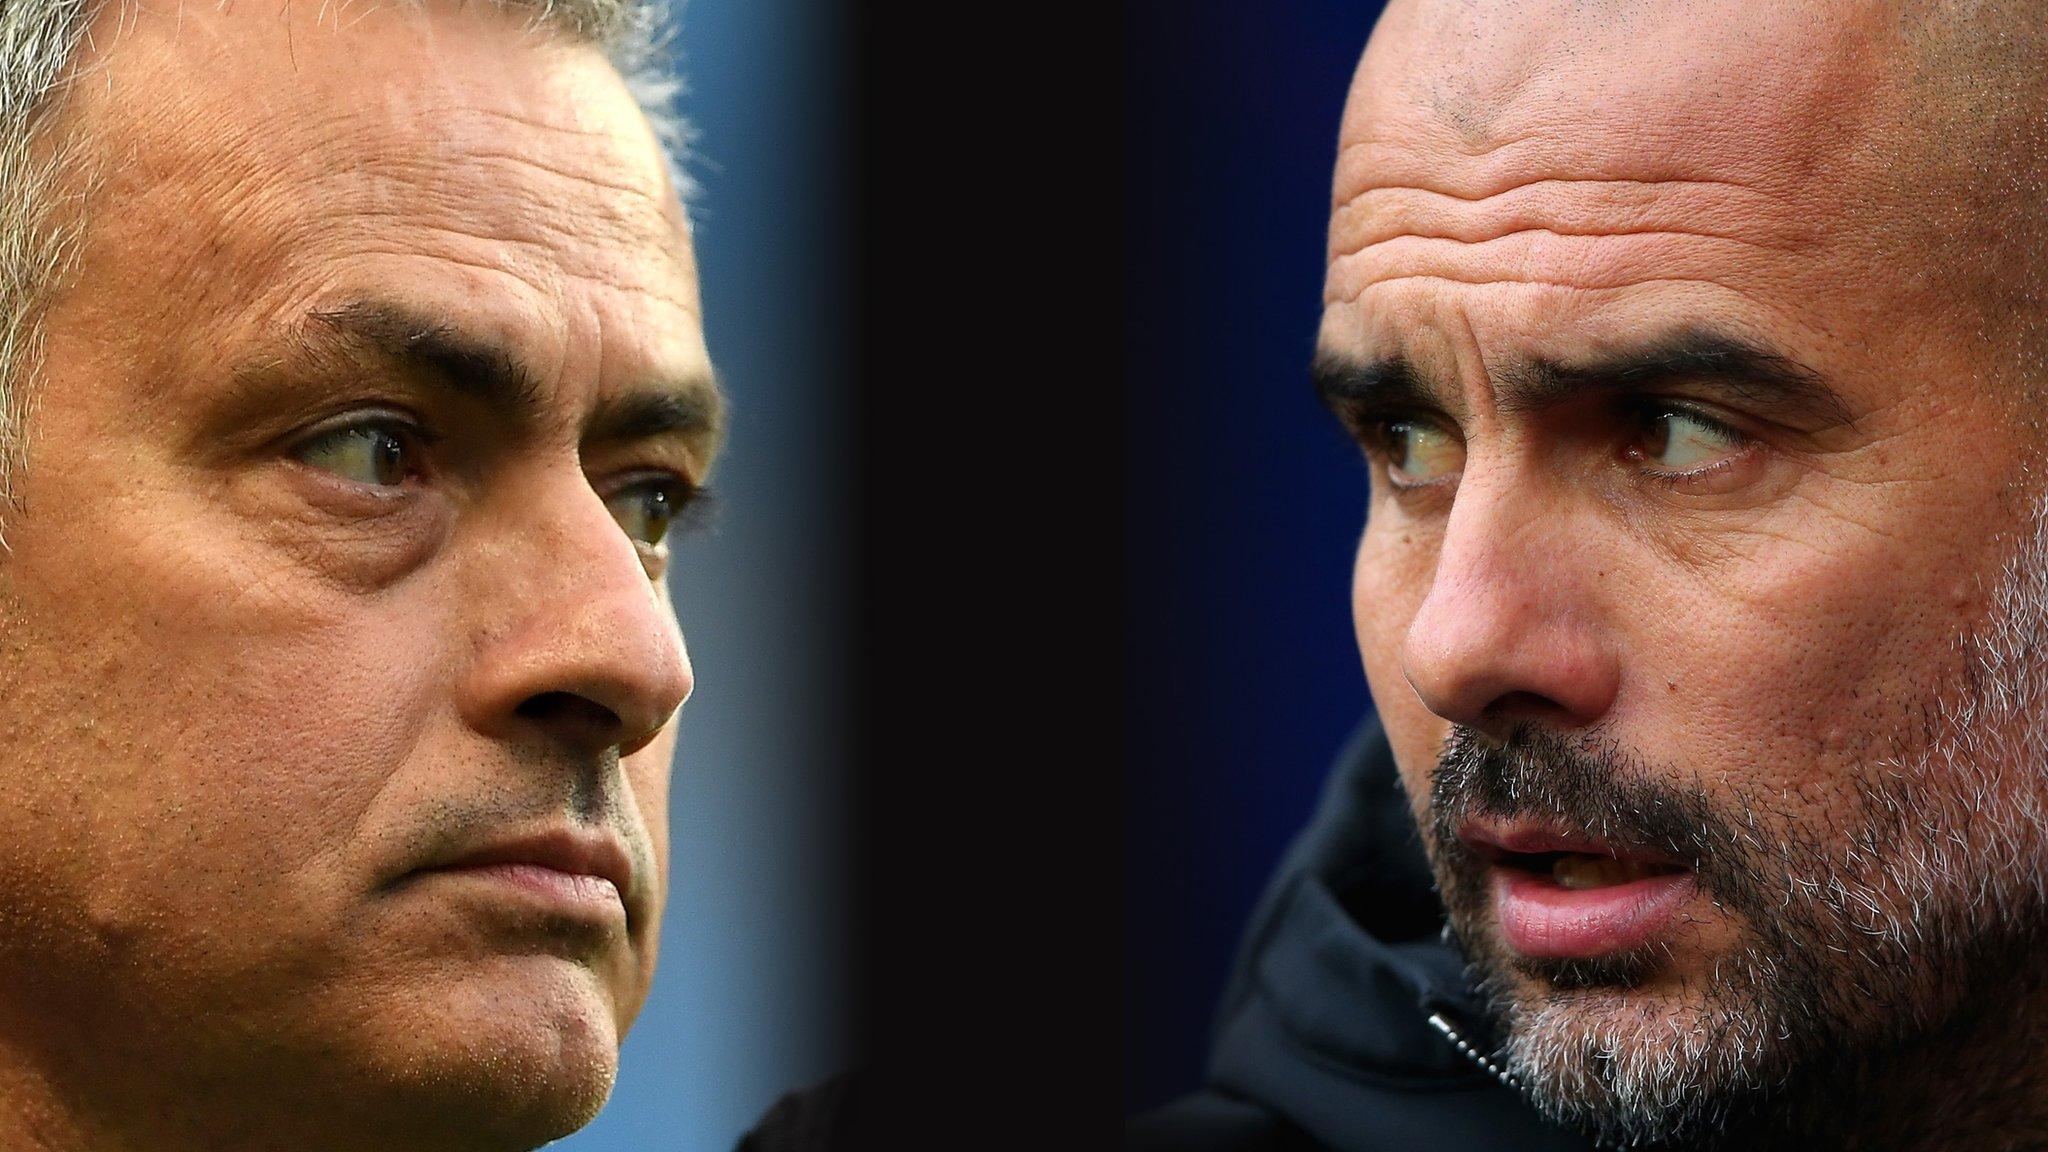 Jose Mourinho: Man Utd manager says Man City 'cannot buy class'